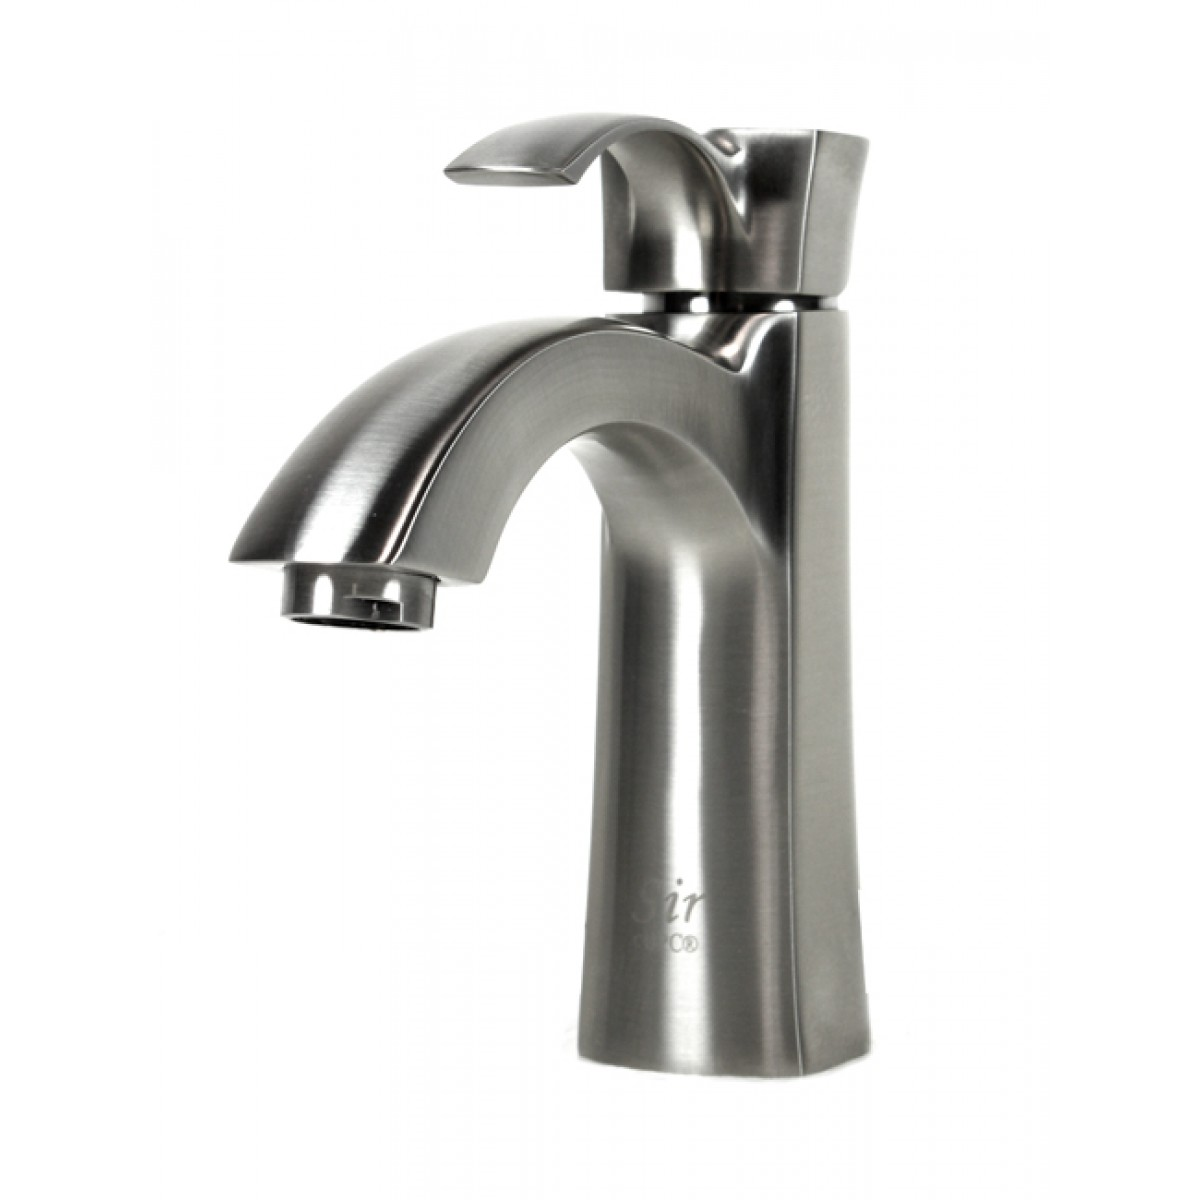 ... Nickel Bathroom Lavatory Vessel Sink Faucet - 6-1/2 x 3-1/4 Inch